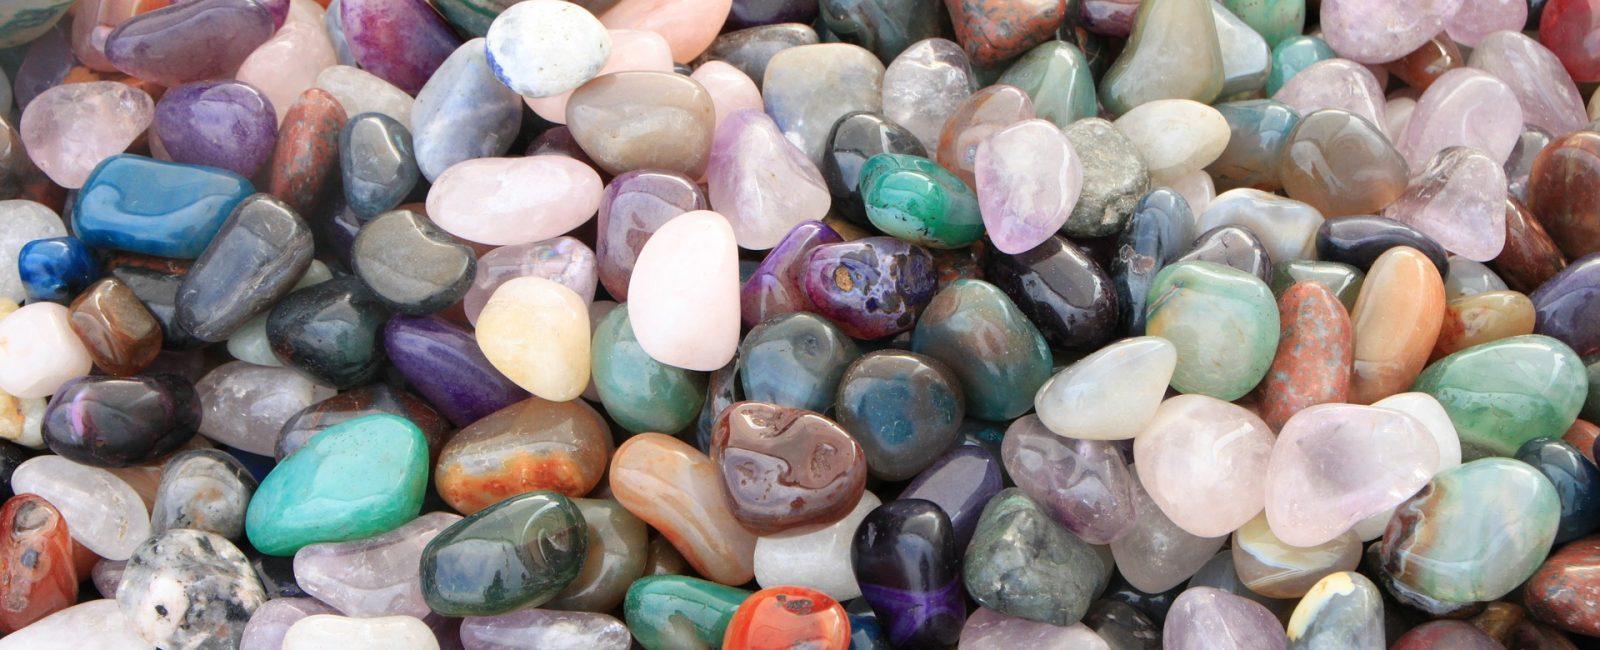 rocks, mineralss, and gemstones - tumbled gemstones